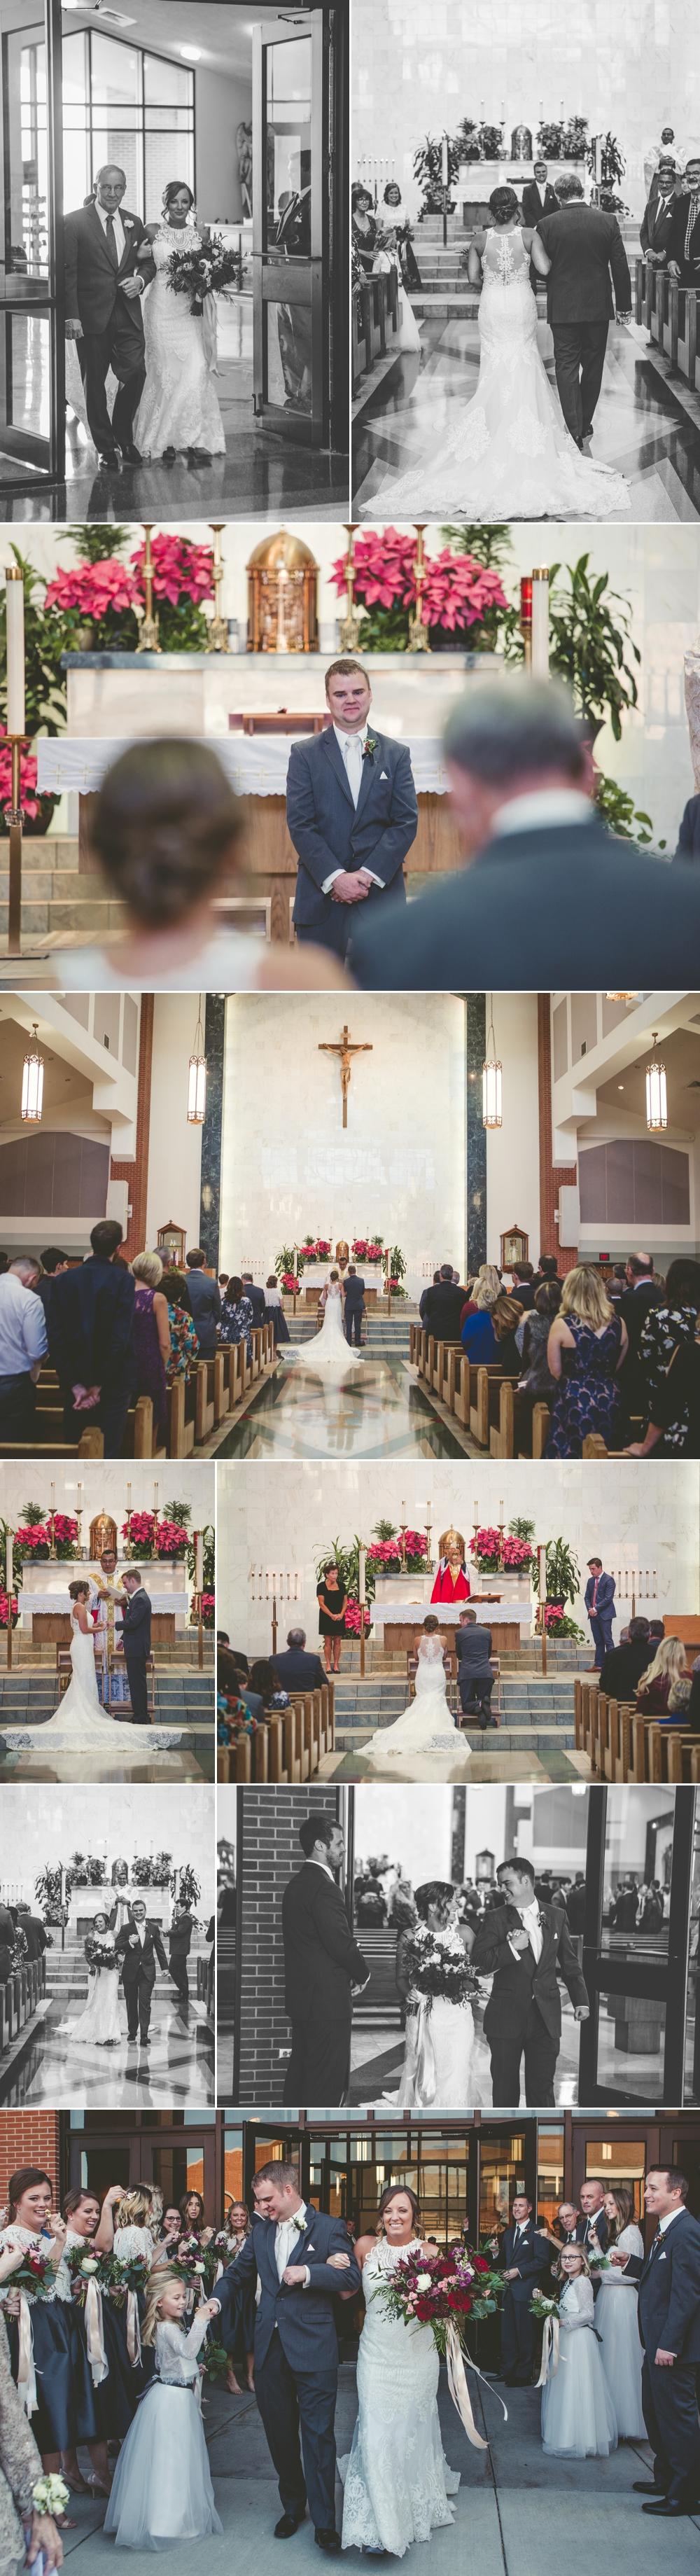 jason_domingues_photography_best_kansas_city_photographer_kc_weddings_mission_theater_0002.JPG